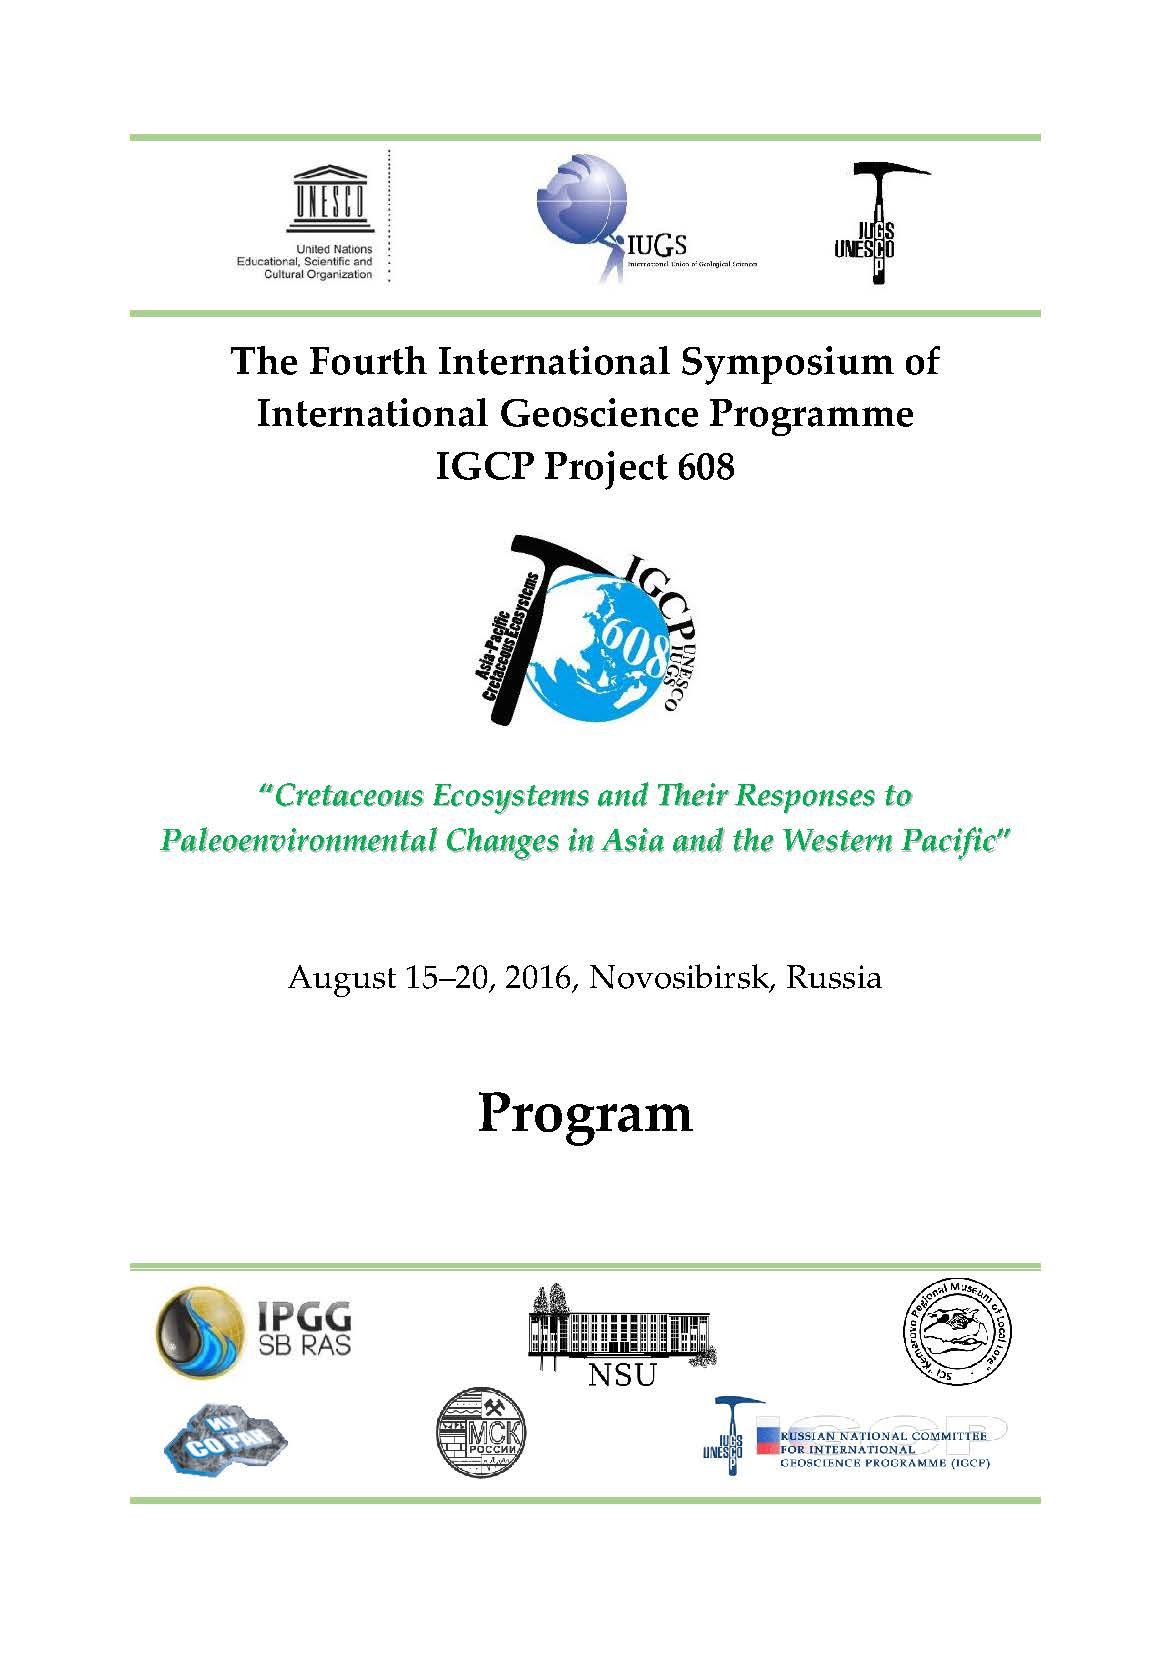 IGCP608 / UNESCO/IUGS International Geoscience Programme